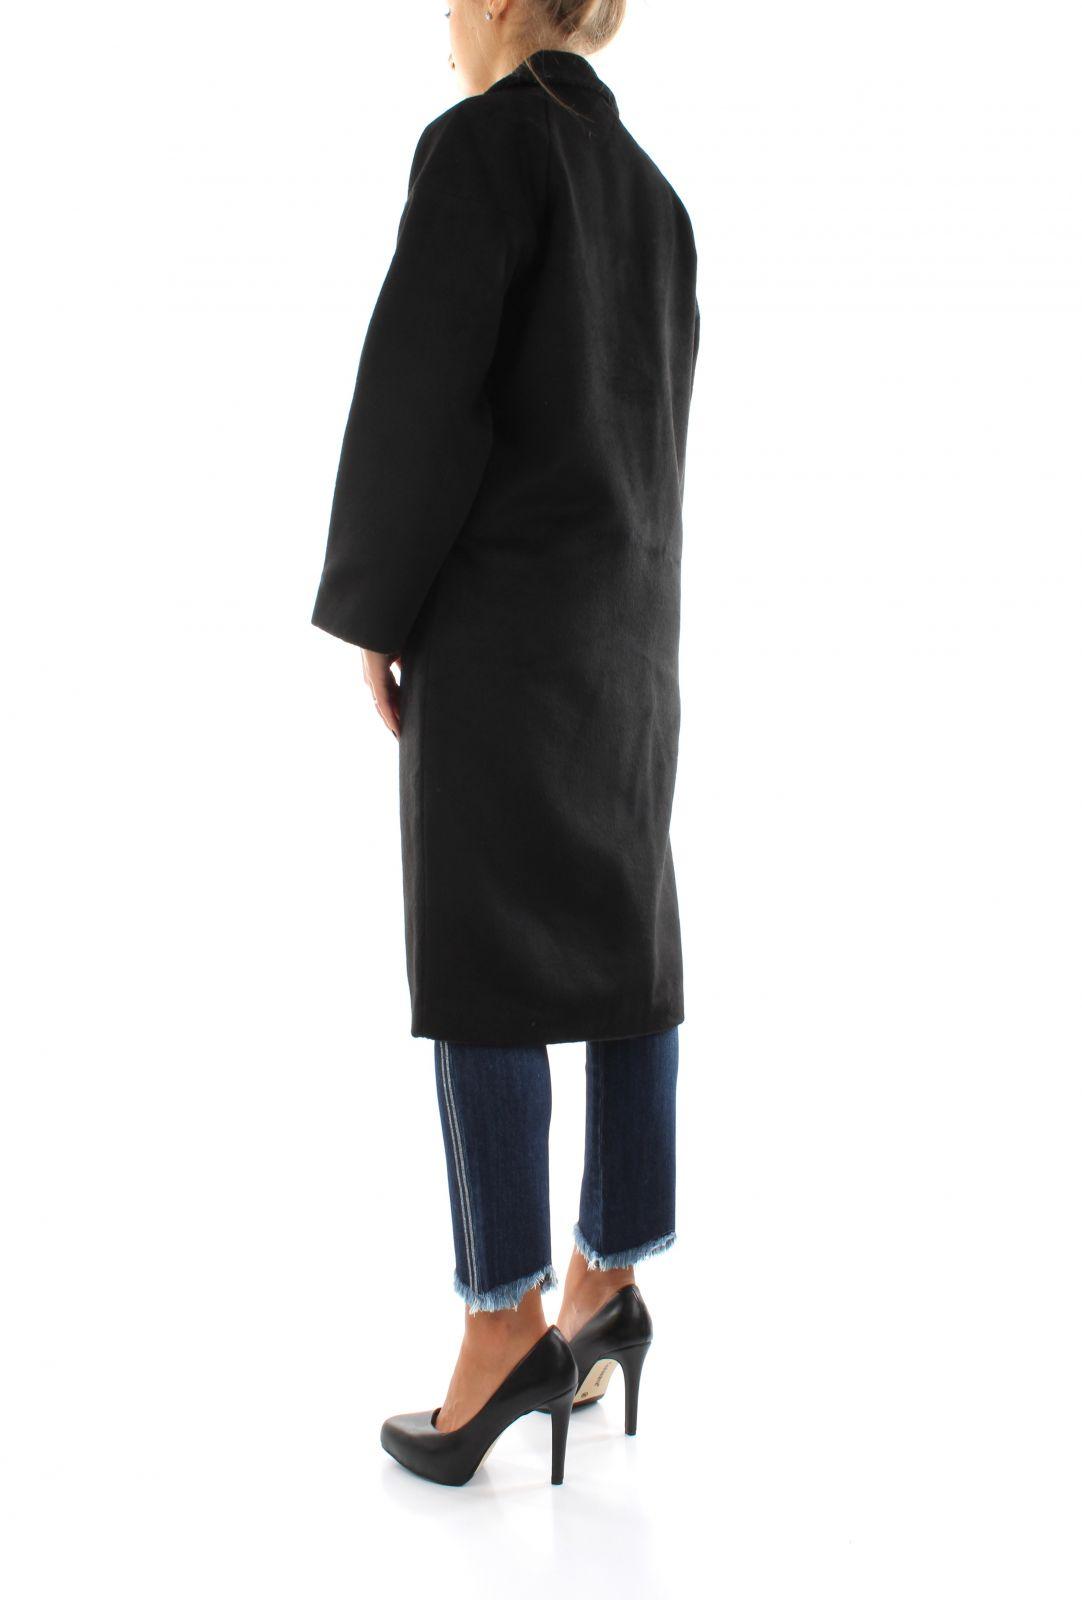 ONLVAL 7-8 SLEEVE LONG WOOD ONLY | Coat | 15208444BLACK